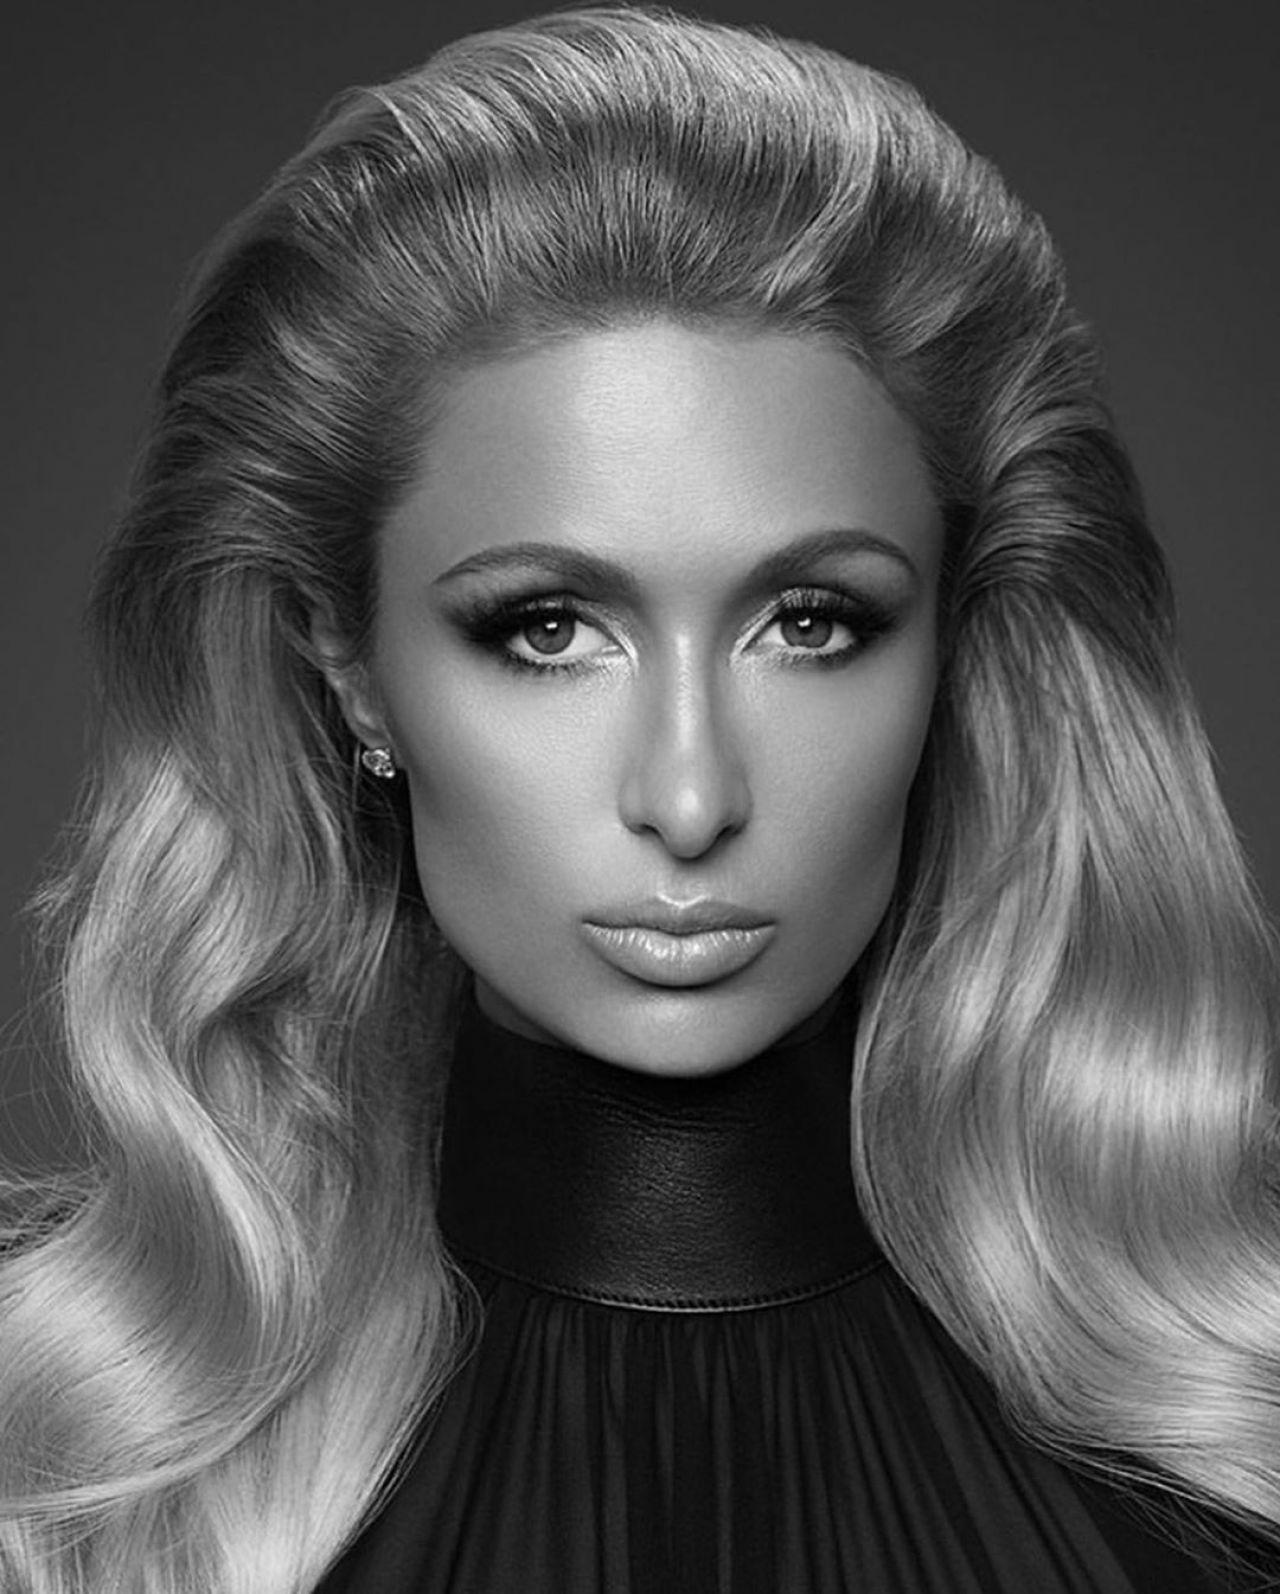 Celebrity Sex Tape Pioneer Paris Hilton In Tmrw Magazine, Fuck Is She Hot - Celeblr-2685